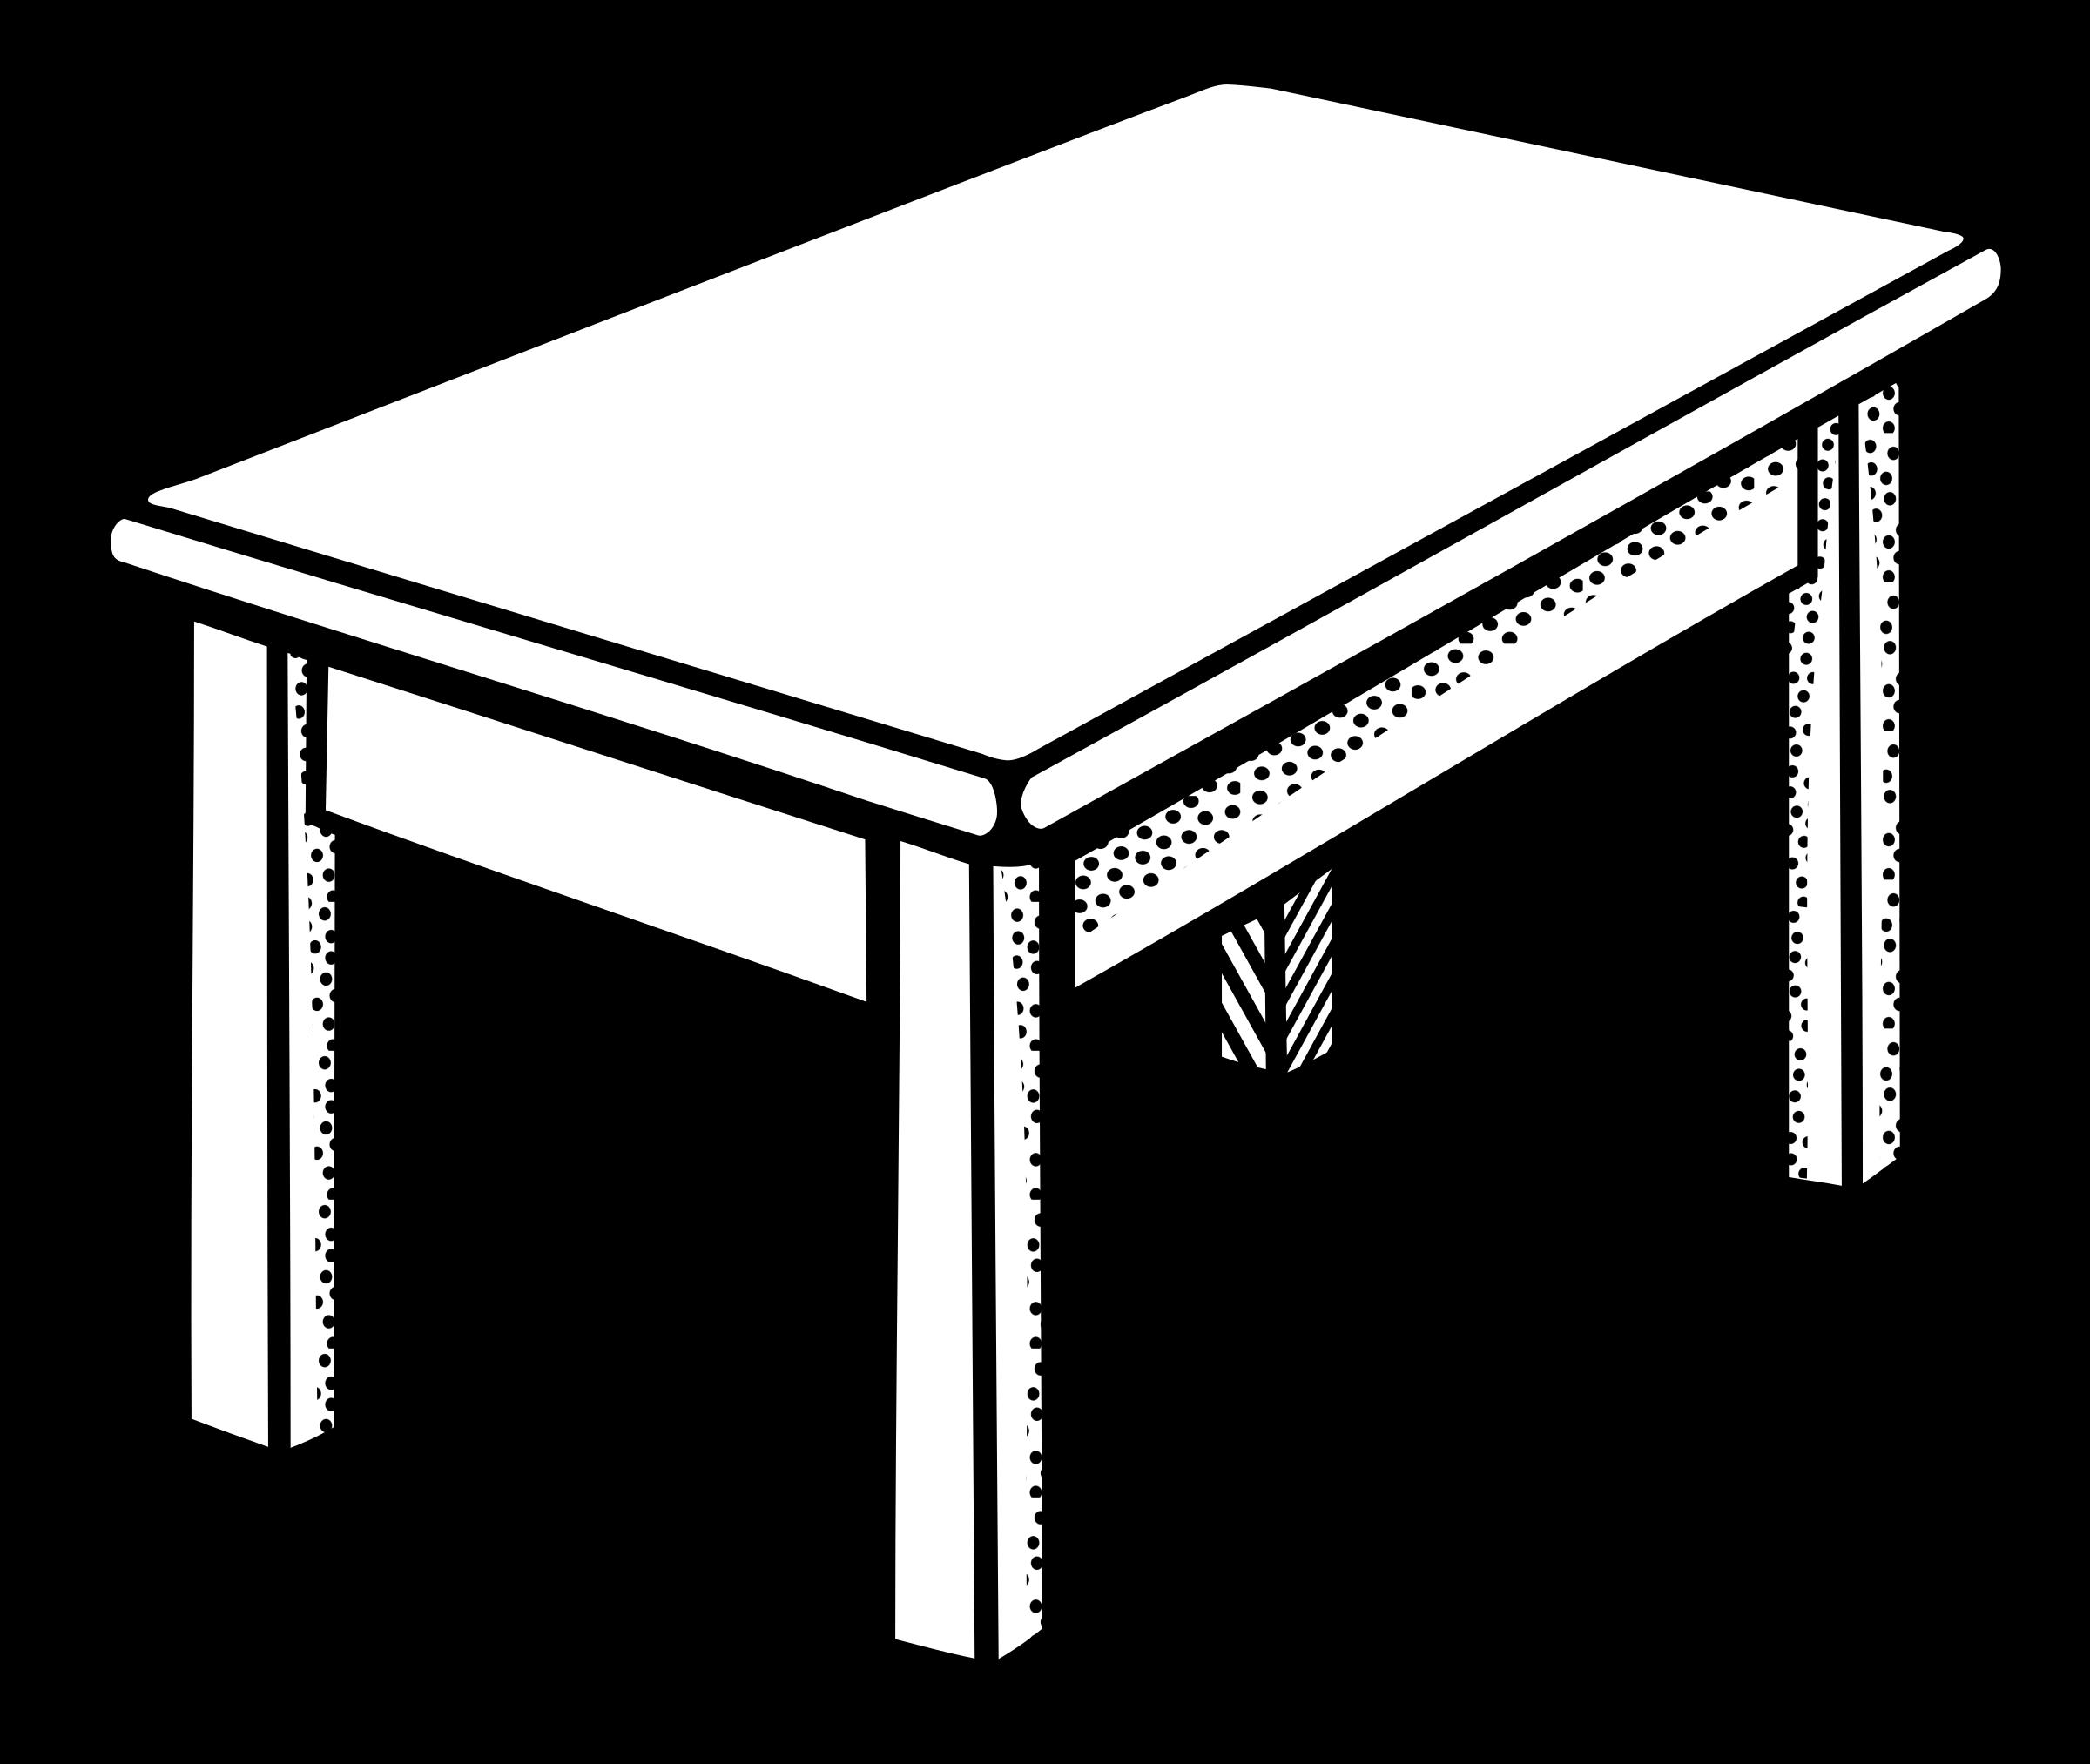 Clip art tables clipartall